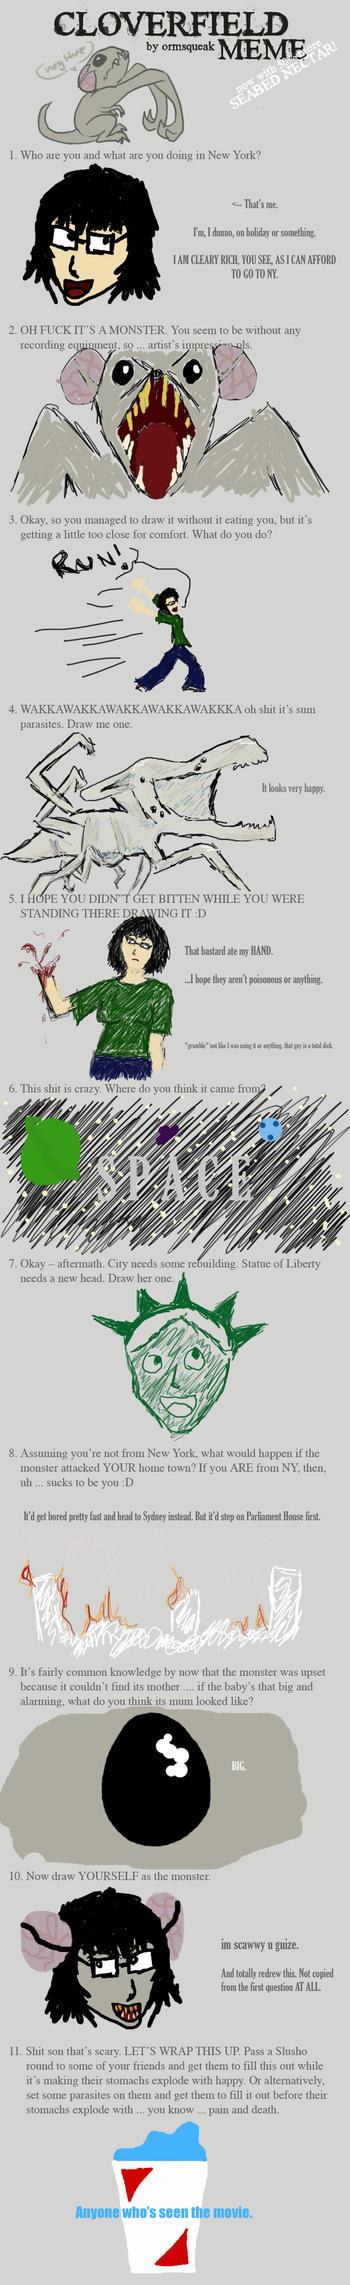 Cloverfield Meme by sunlight-reflections